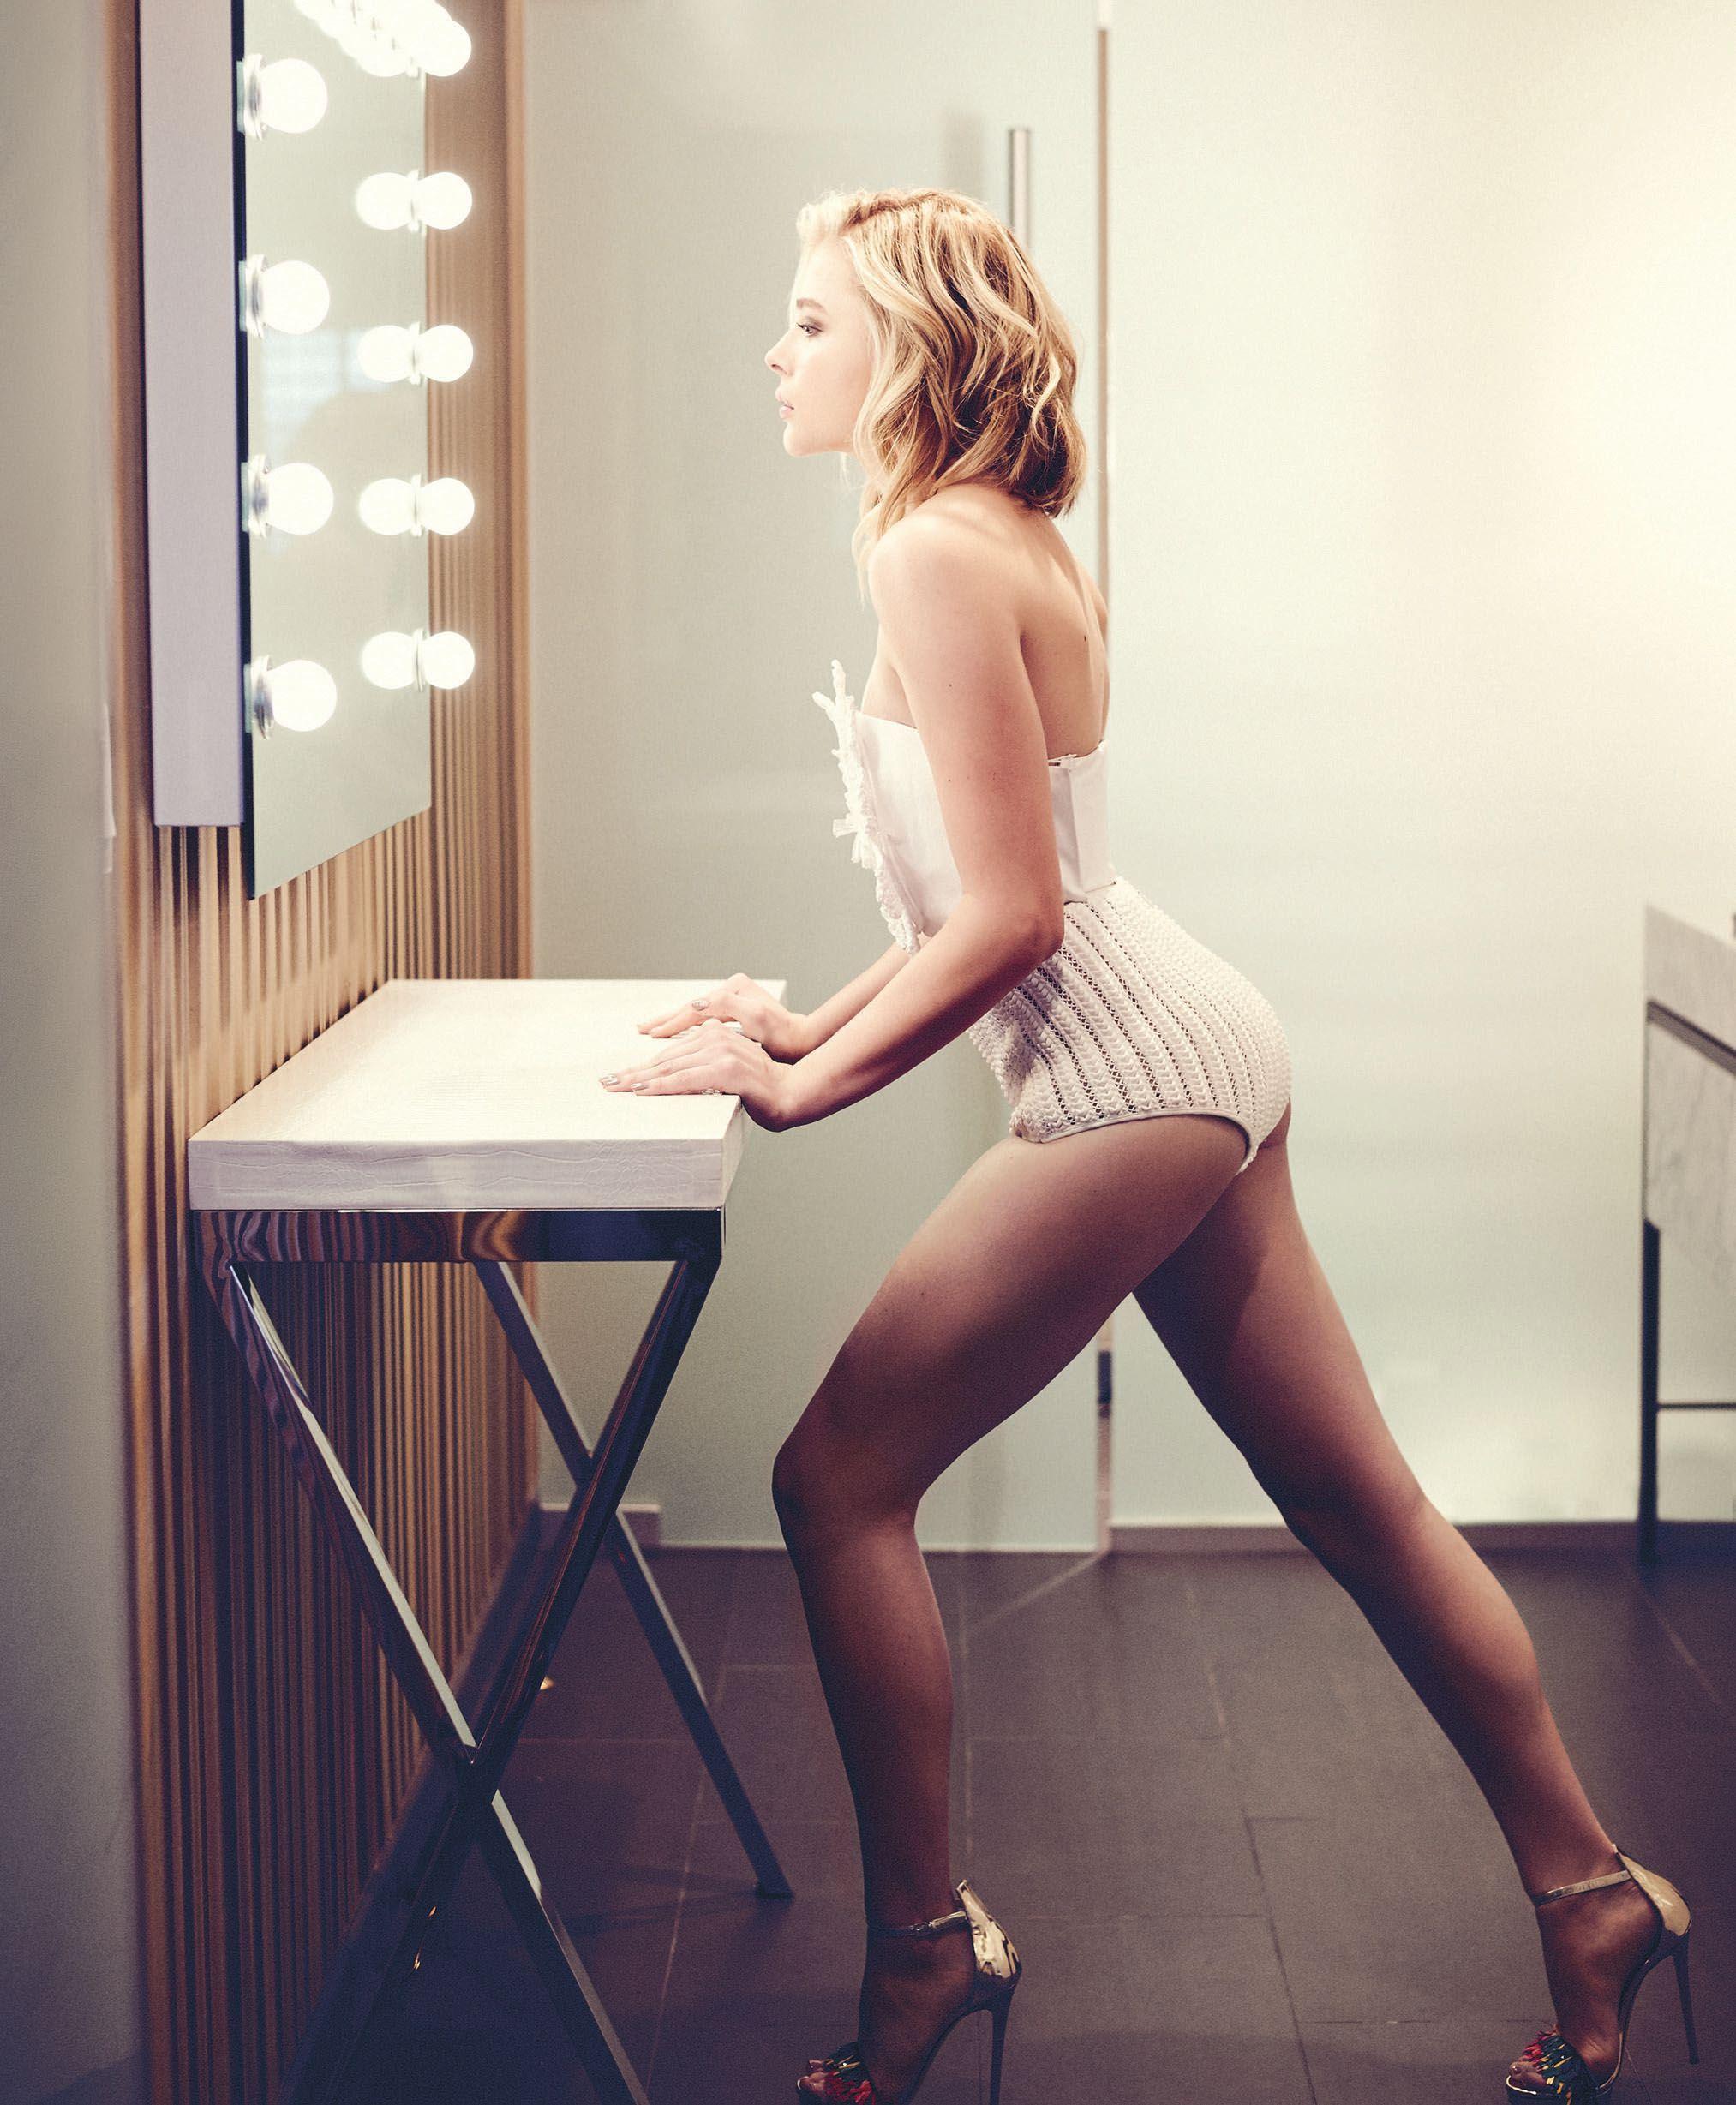 Chloë-Grace-Moretz-Sexy-5